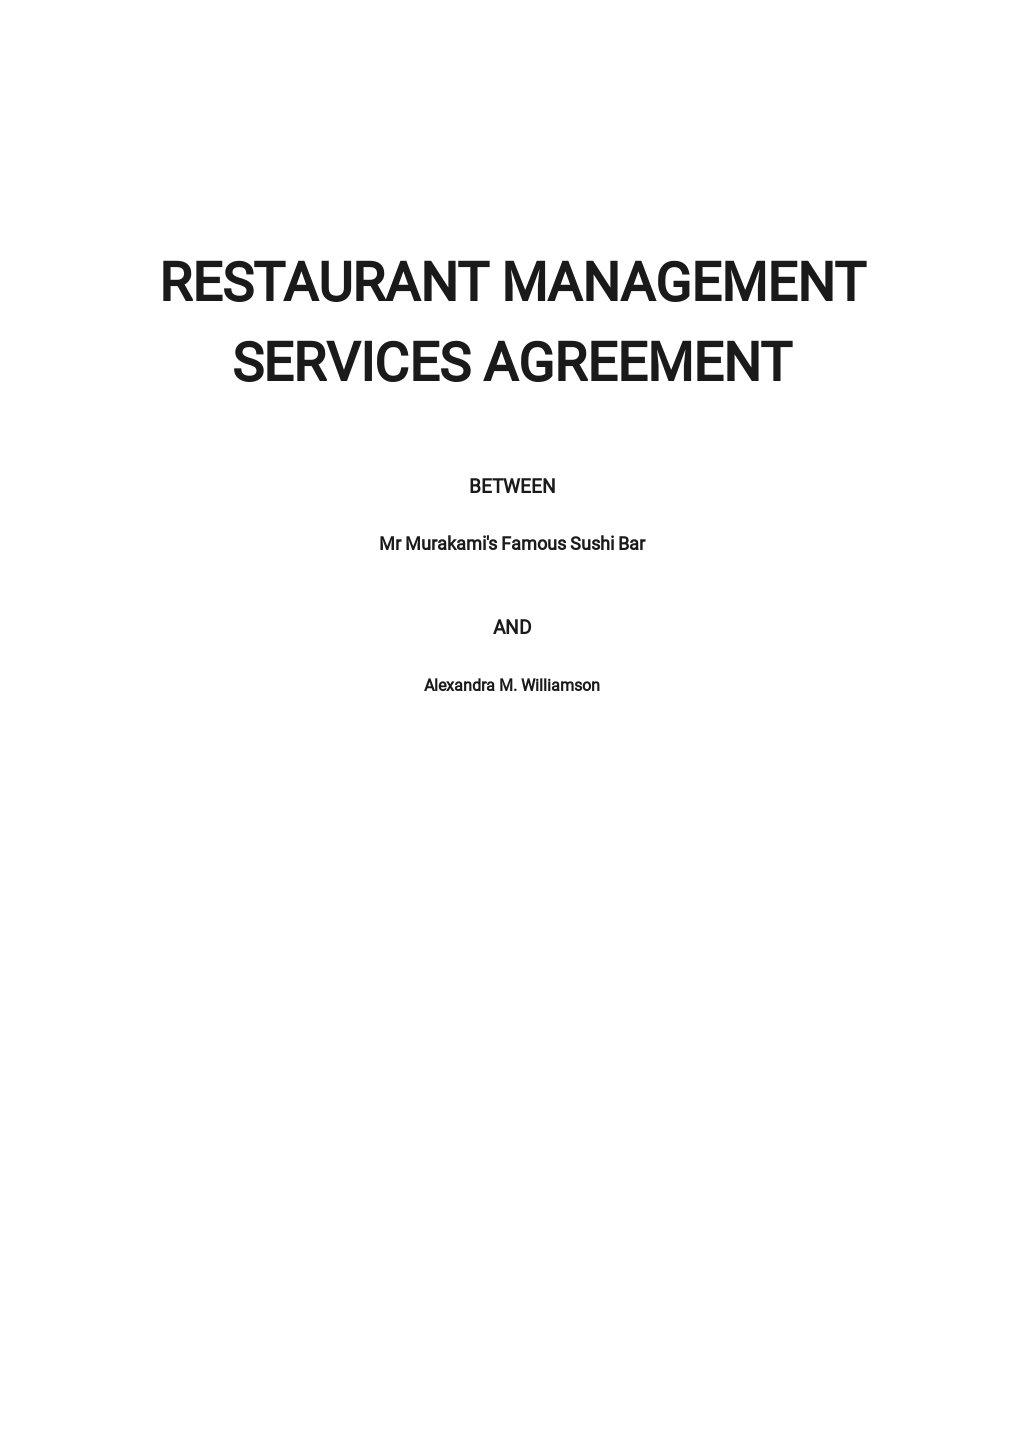 Restaurant Management Services Agreement Template.jpe